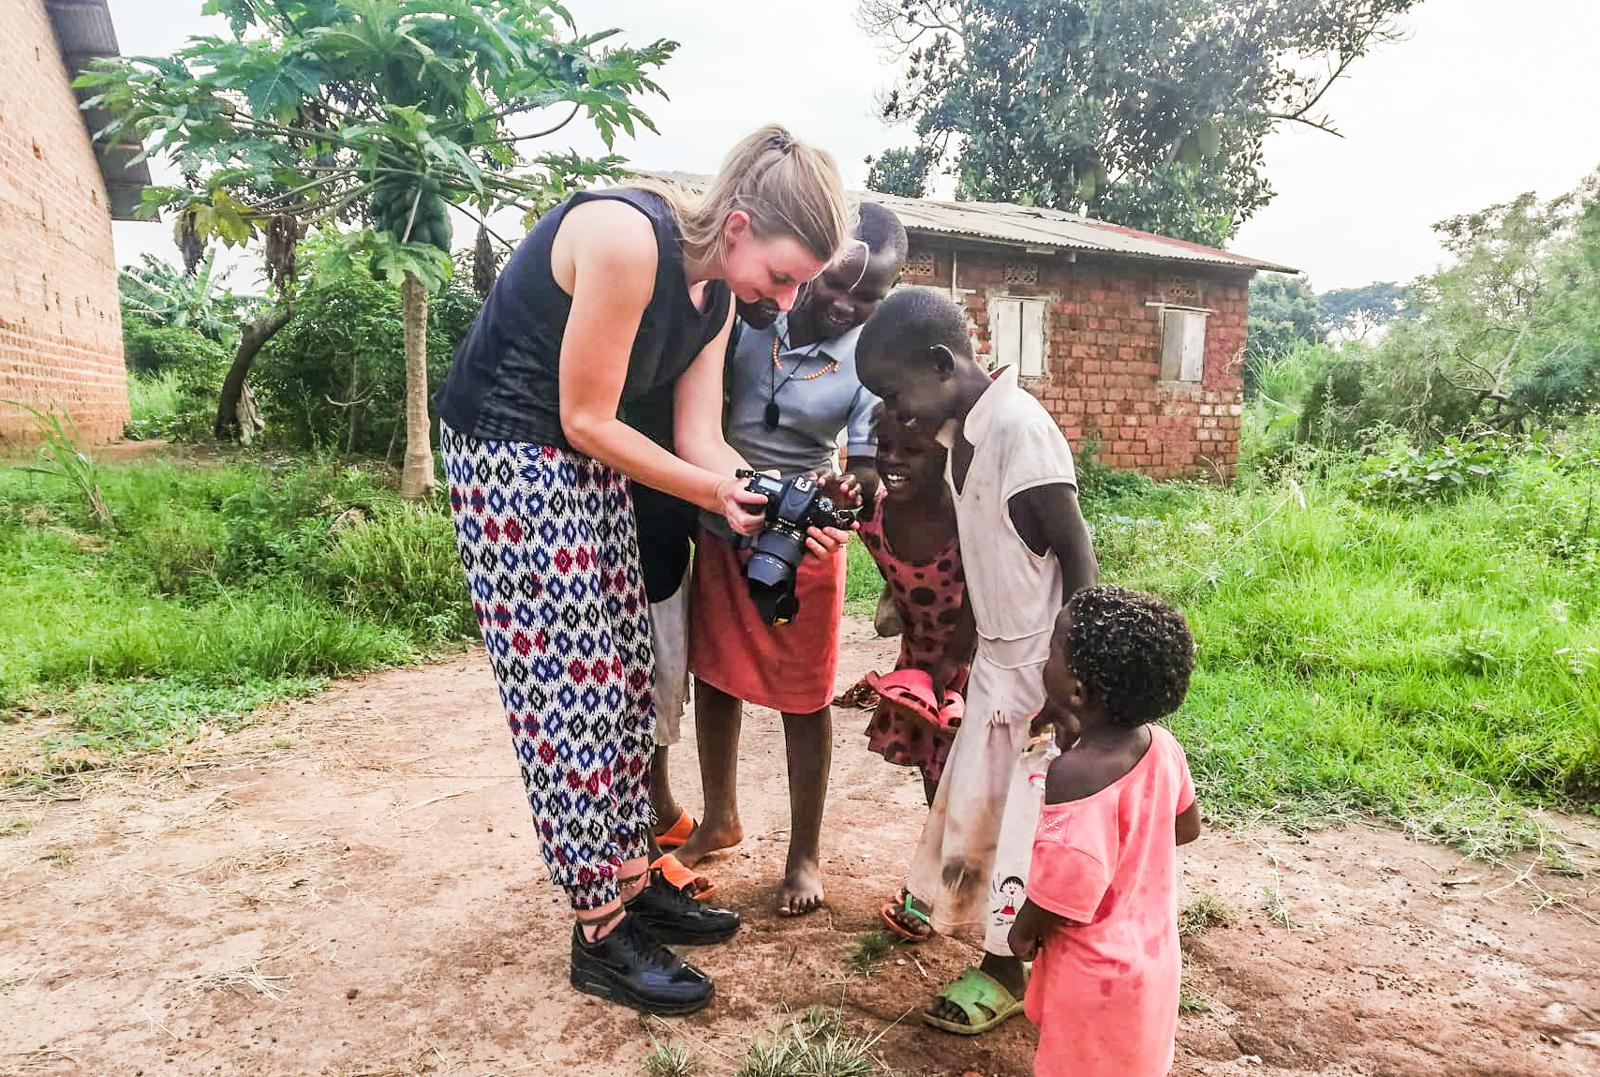 Trouwfotograaf Denise Motz